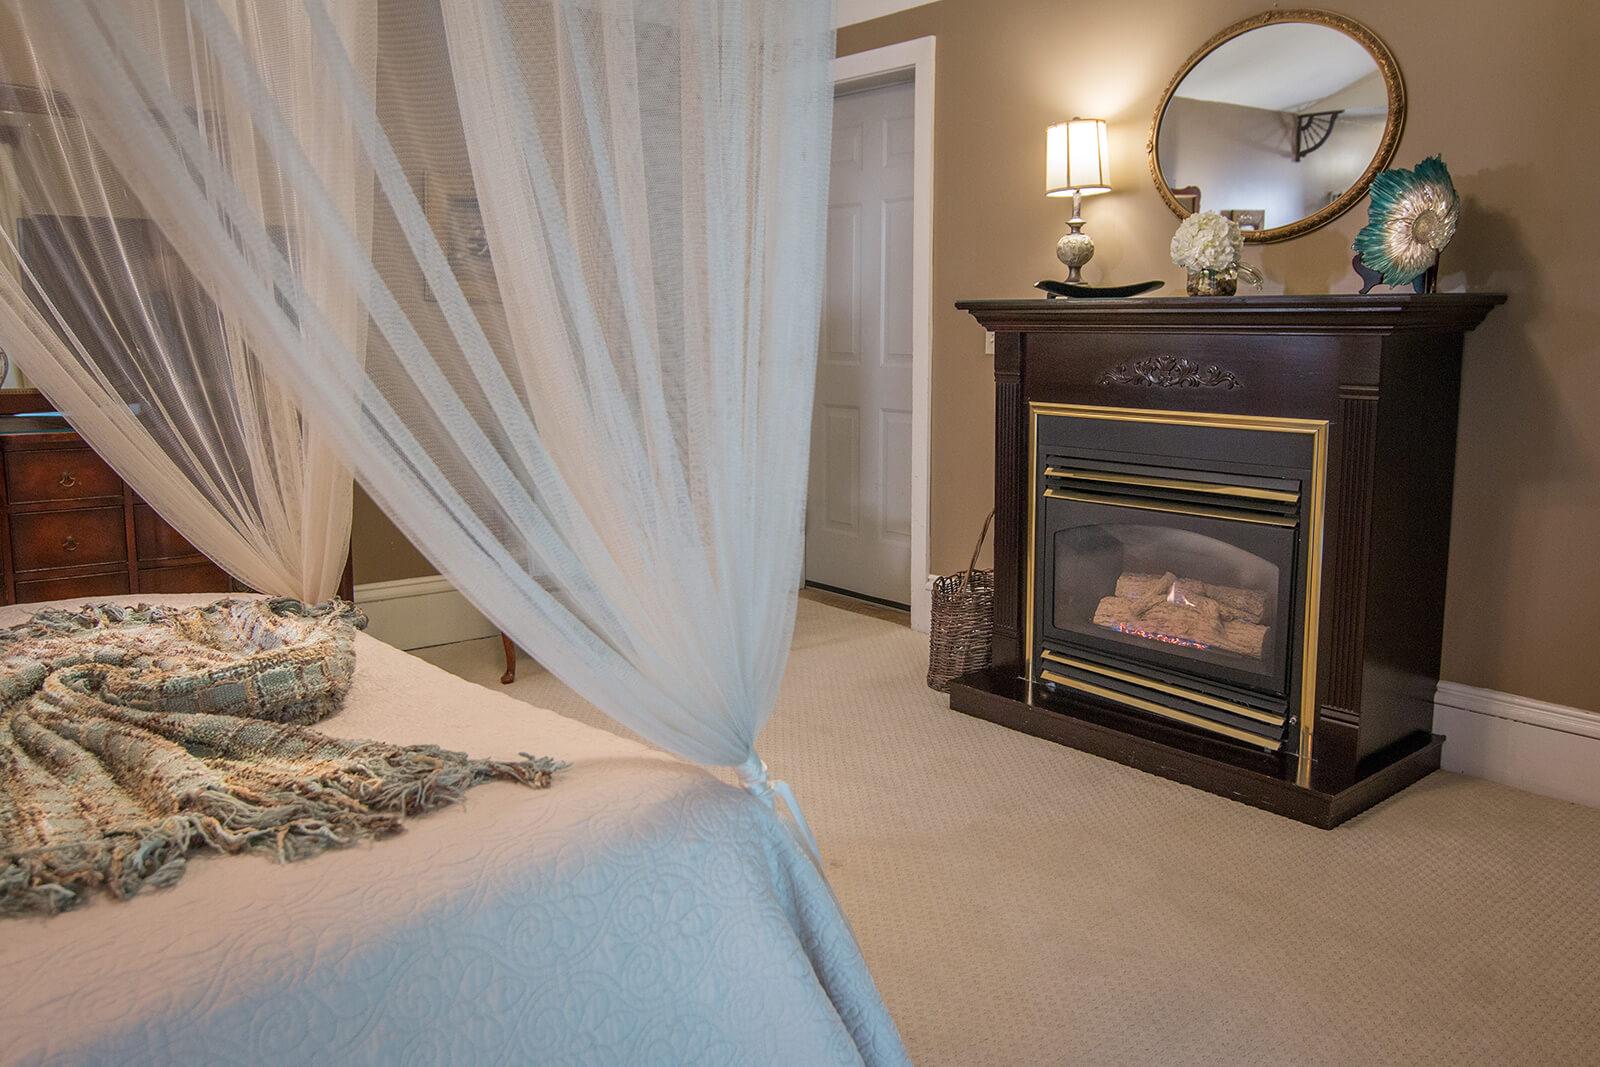 Magnolia Amenities, Magnolia Place Bed & Breakfast, Finger Lakes, NY